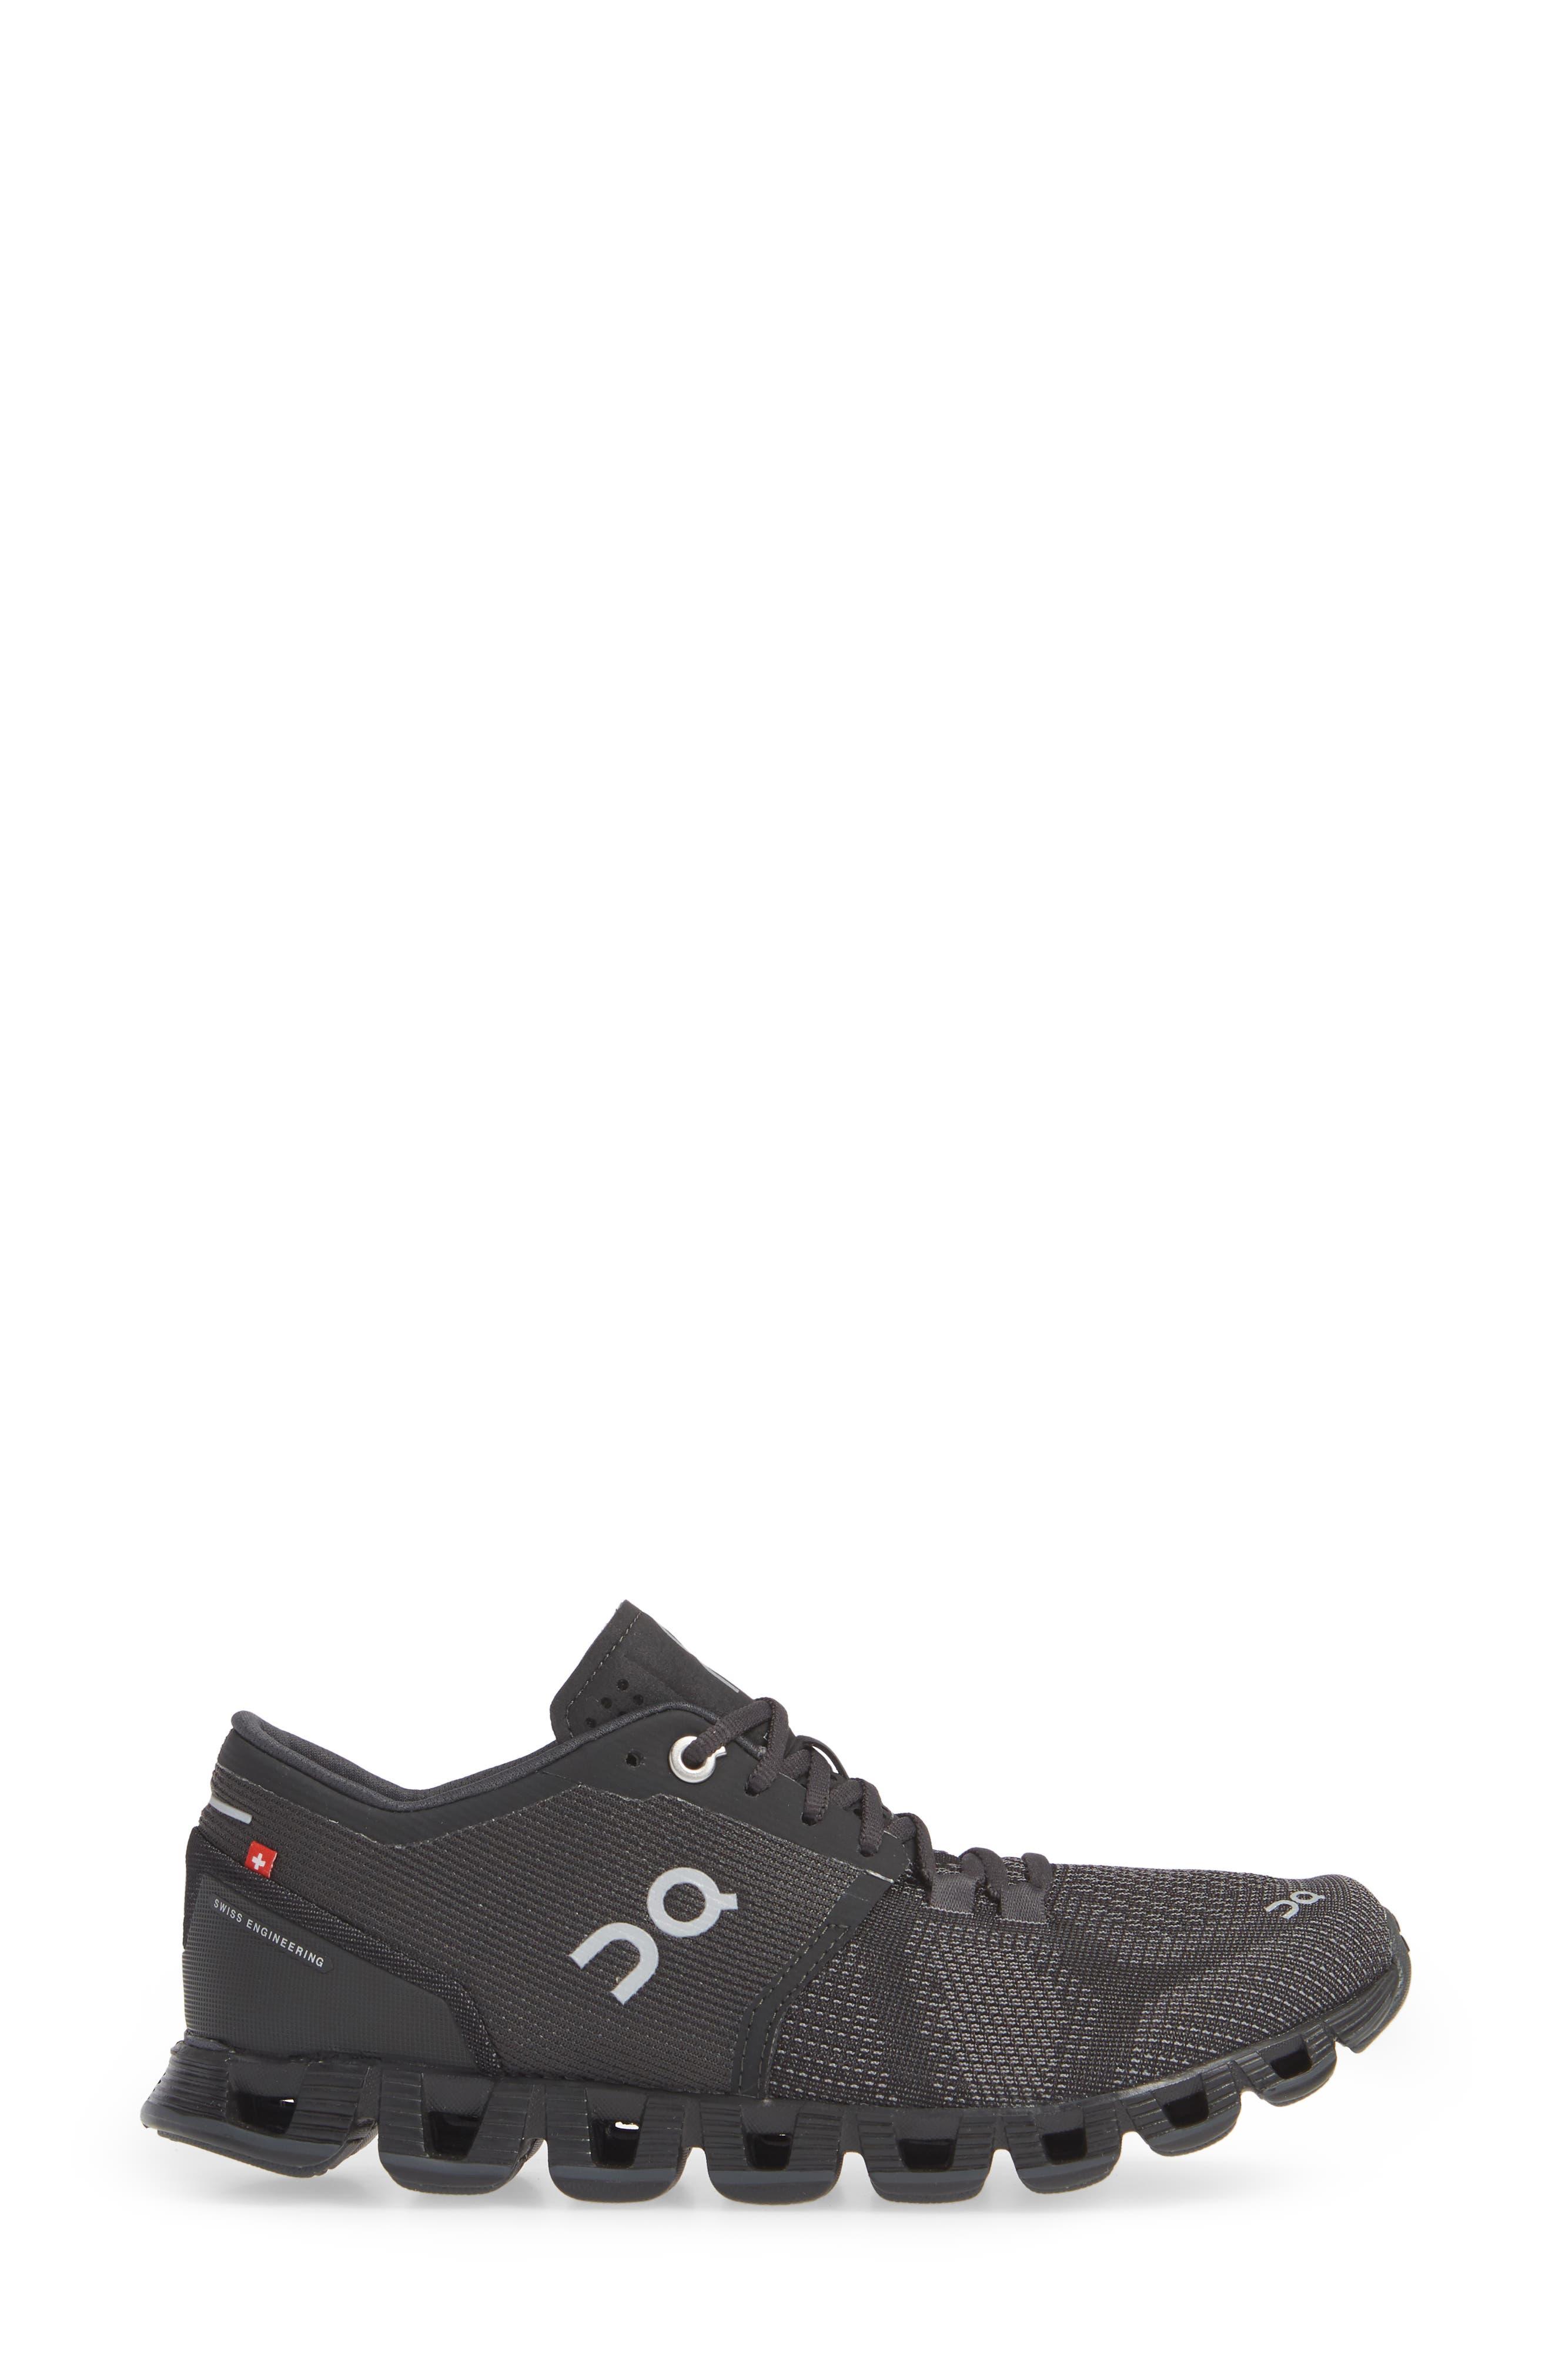 Cloud X Running Shoe,                             Alternate thumbnail 3, color,                             BLACK/ ASPHALT